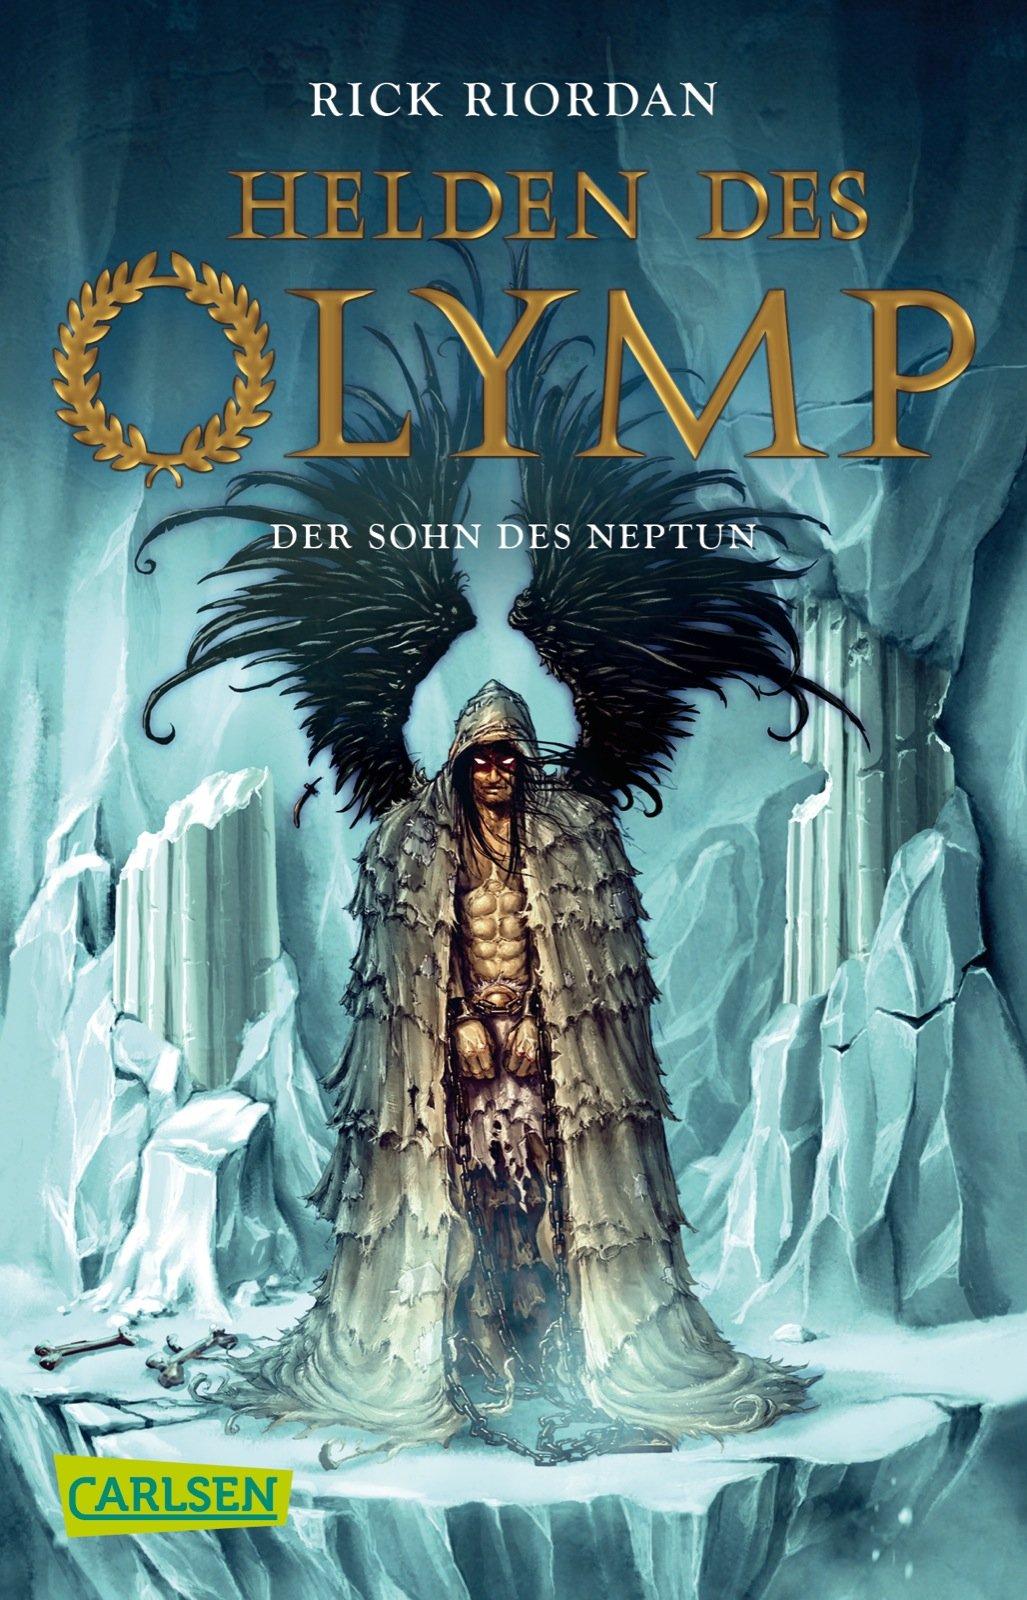 Helden des Olymp 2: Der Sohn des Neptun Taschenbuch – 21. November 2014 Rick Riordan Gabriele Haefs Carlsen 355131358X